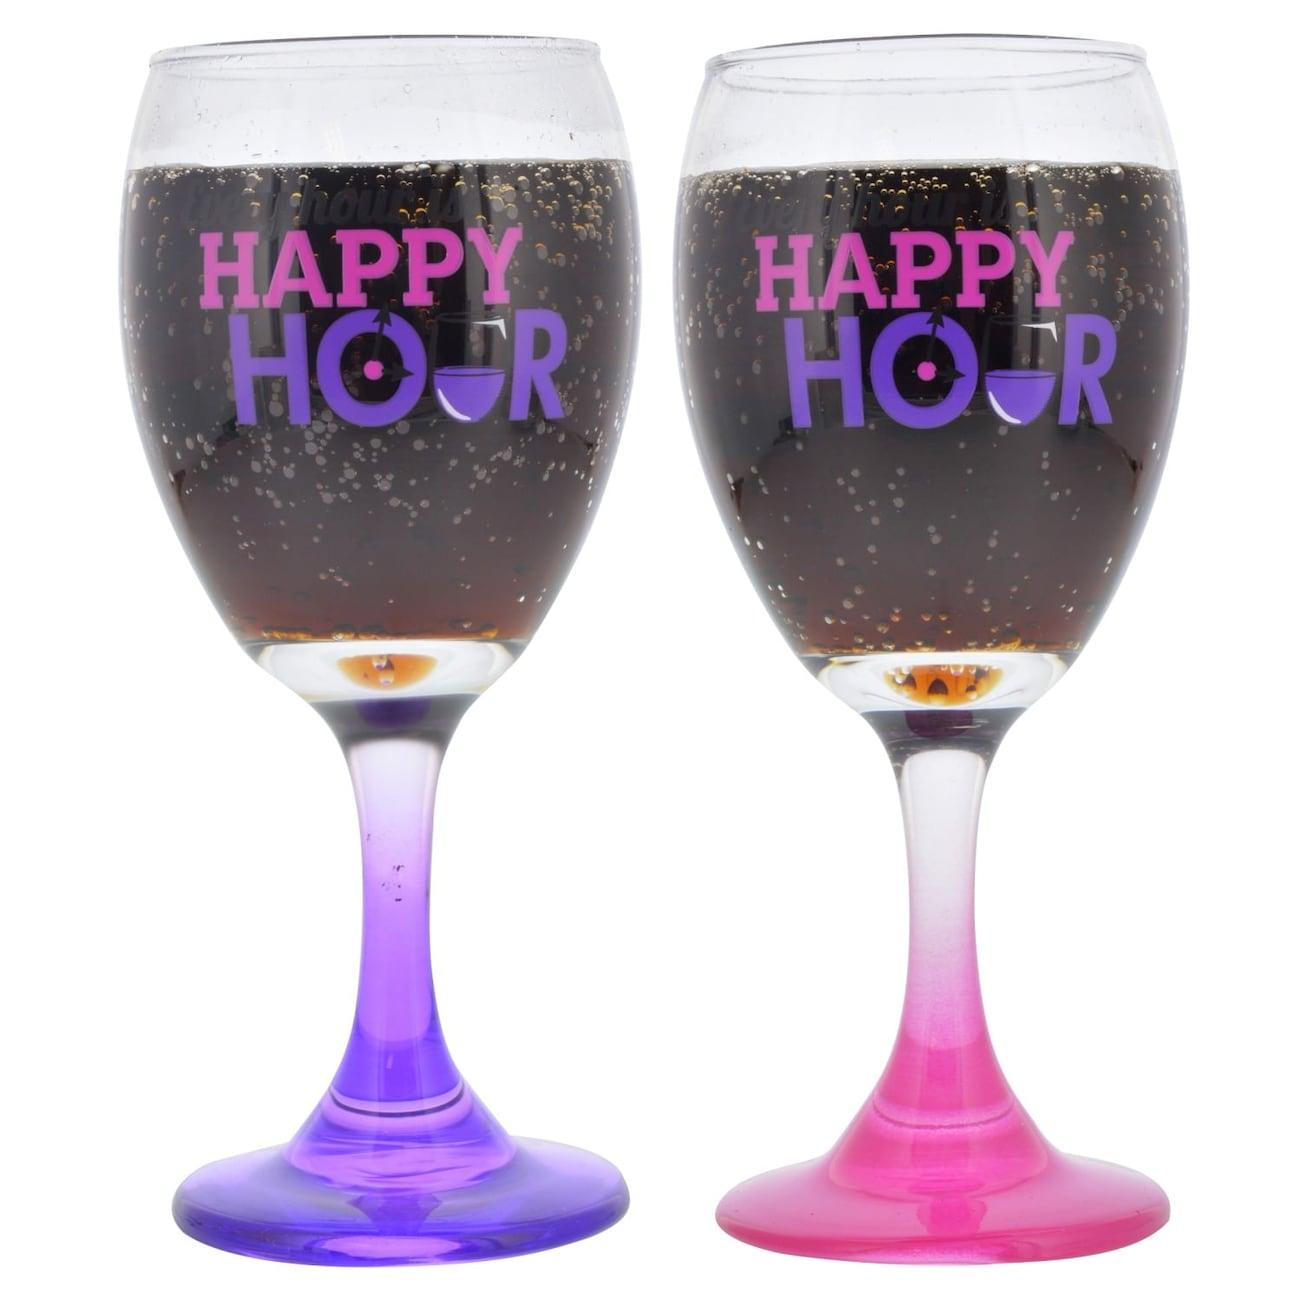 Hy Hour Printed Novelty Wine Gles 10 Oz